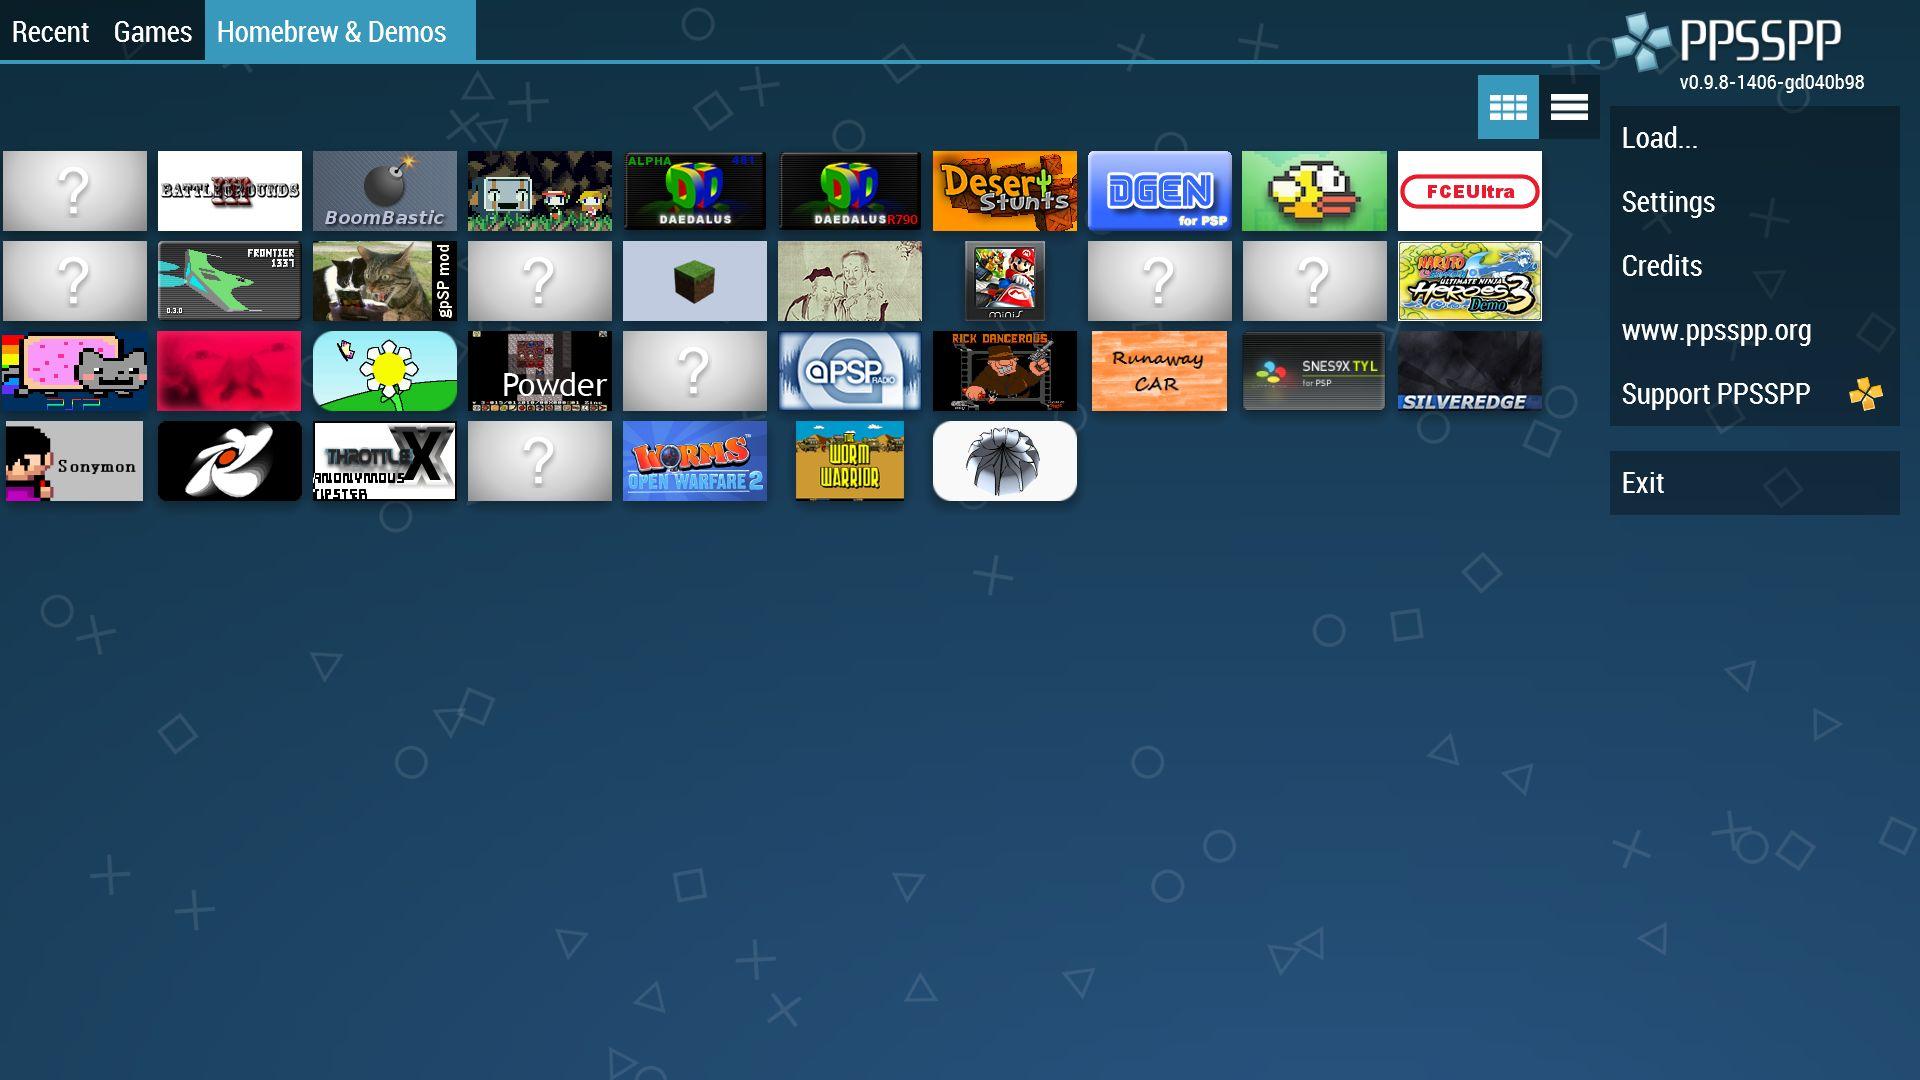 PPSSPP - PSP emulator 游戏截图2